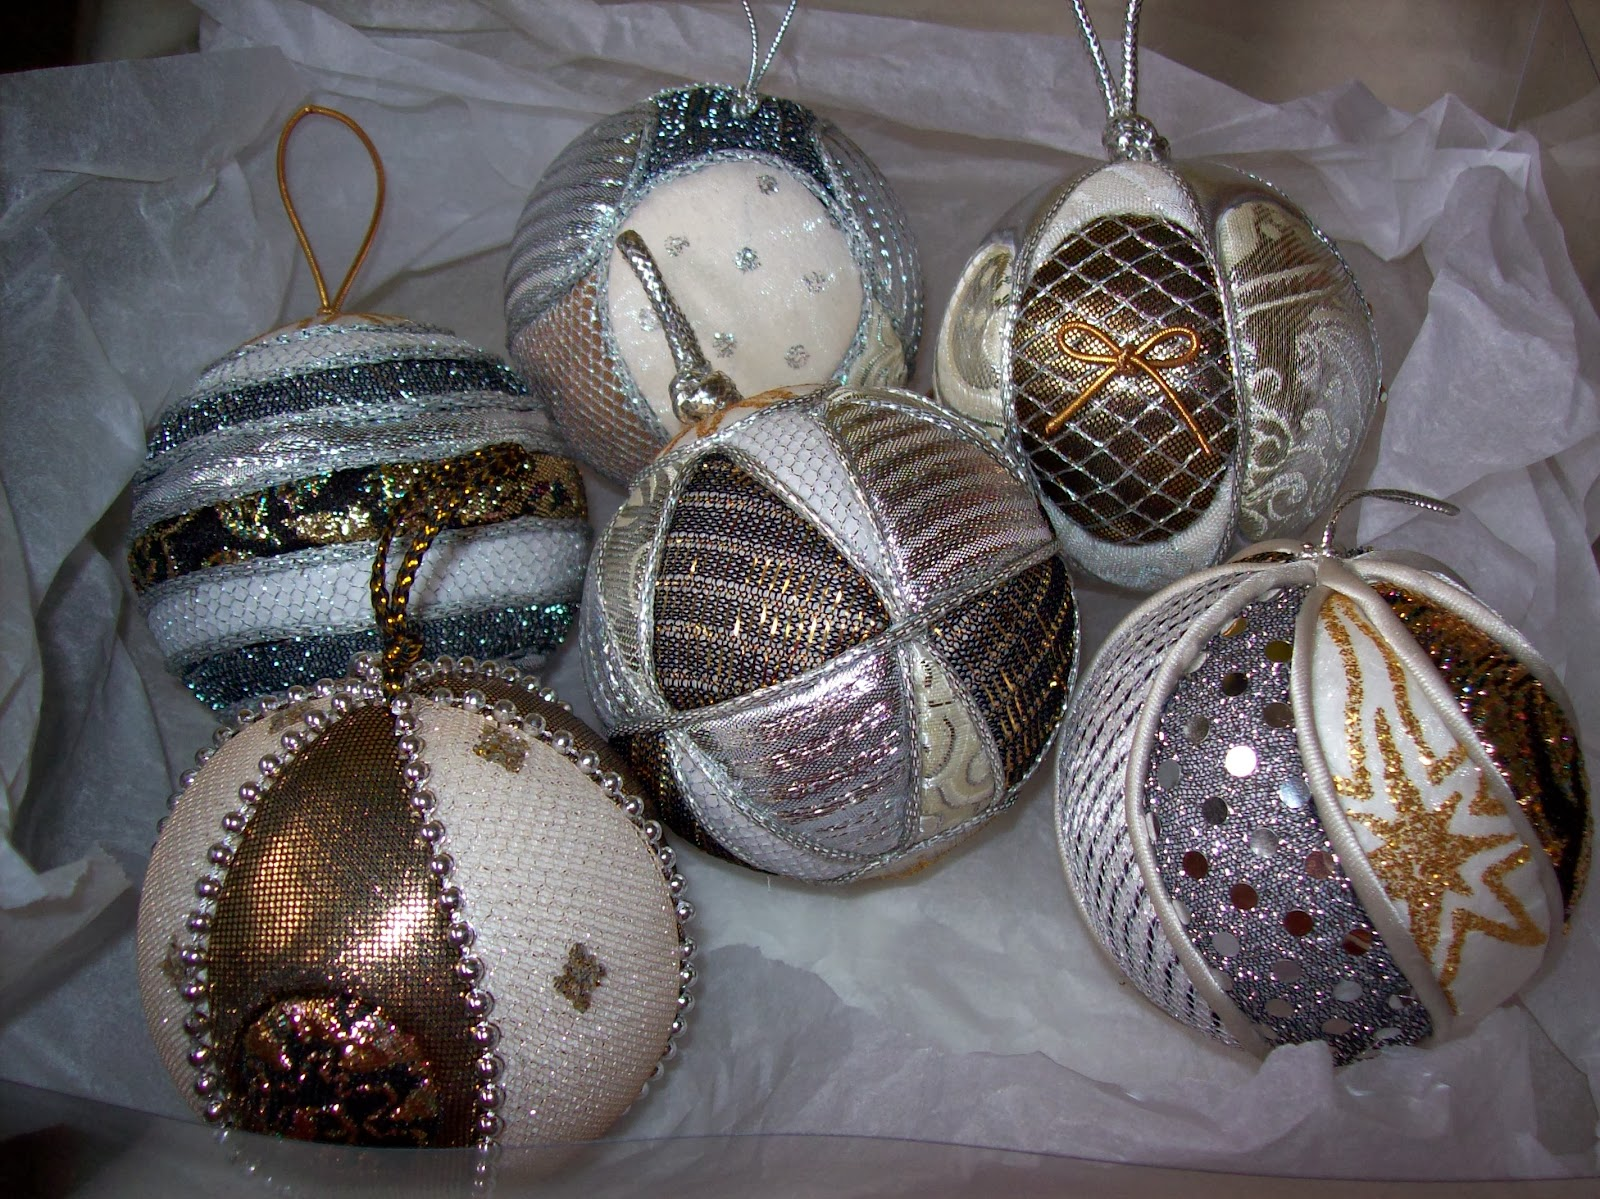 Como Hacer Bolas De Navidad Awesome Pasos Bola Navidad Purpurina - Como-hacer-bolas-de-navidad